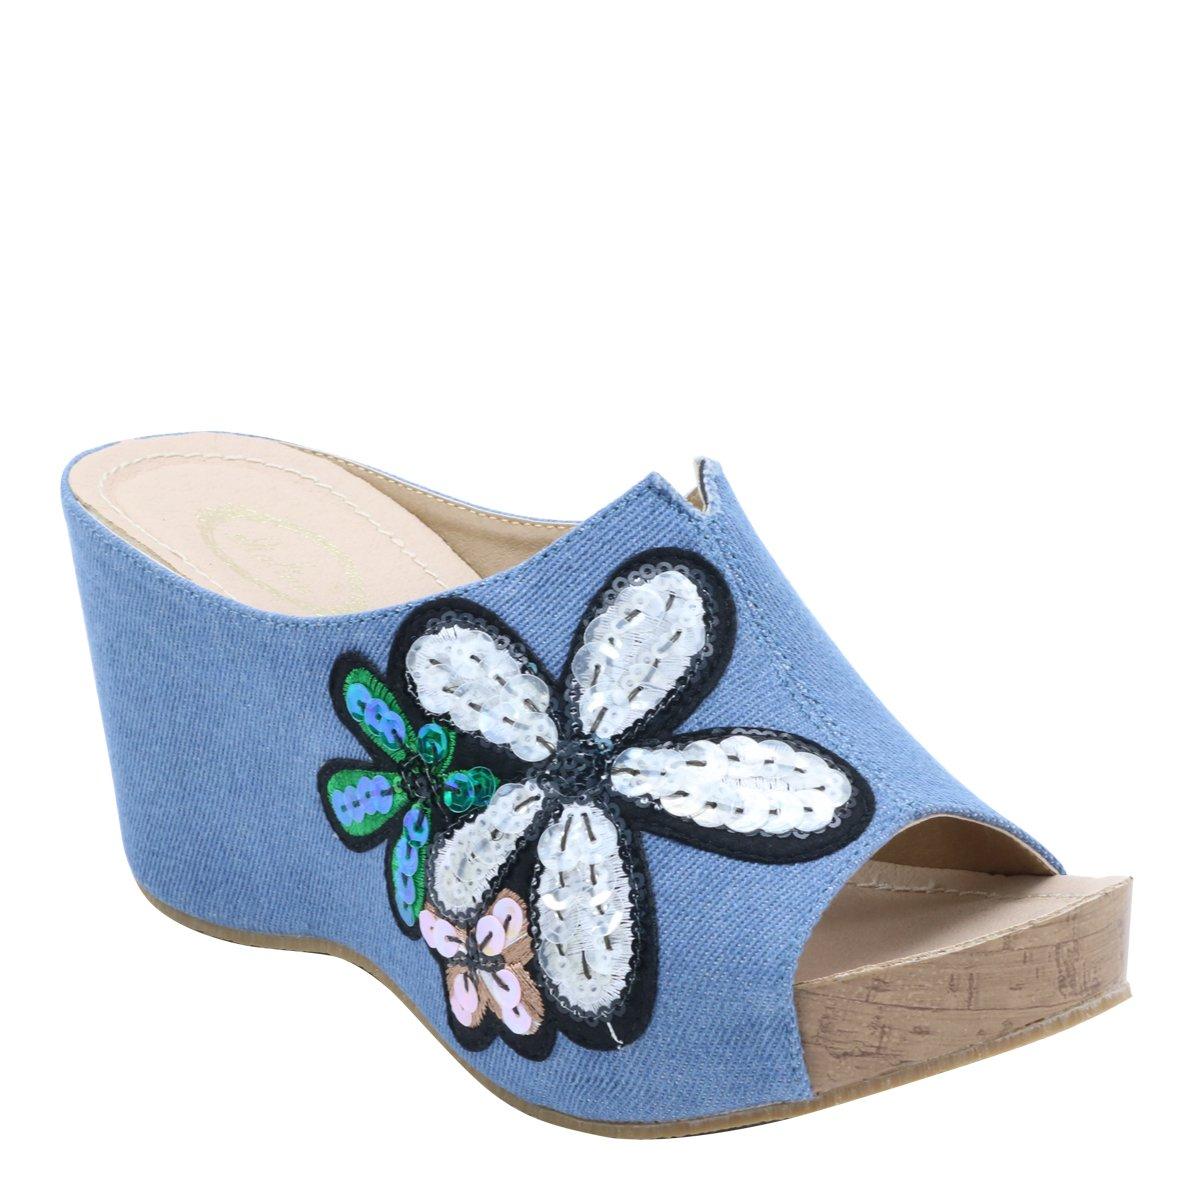 New Master Women's Embroidery Platform Wedge Sandals B0749HSB4W 8.5 B(M) US|Blue Denim